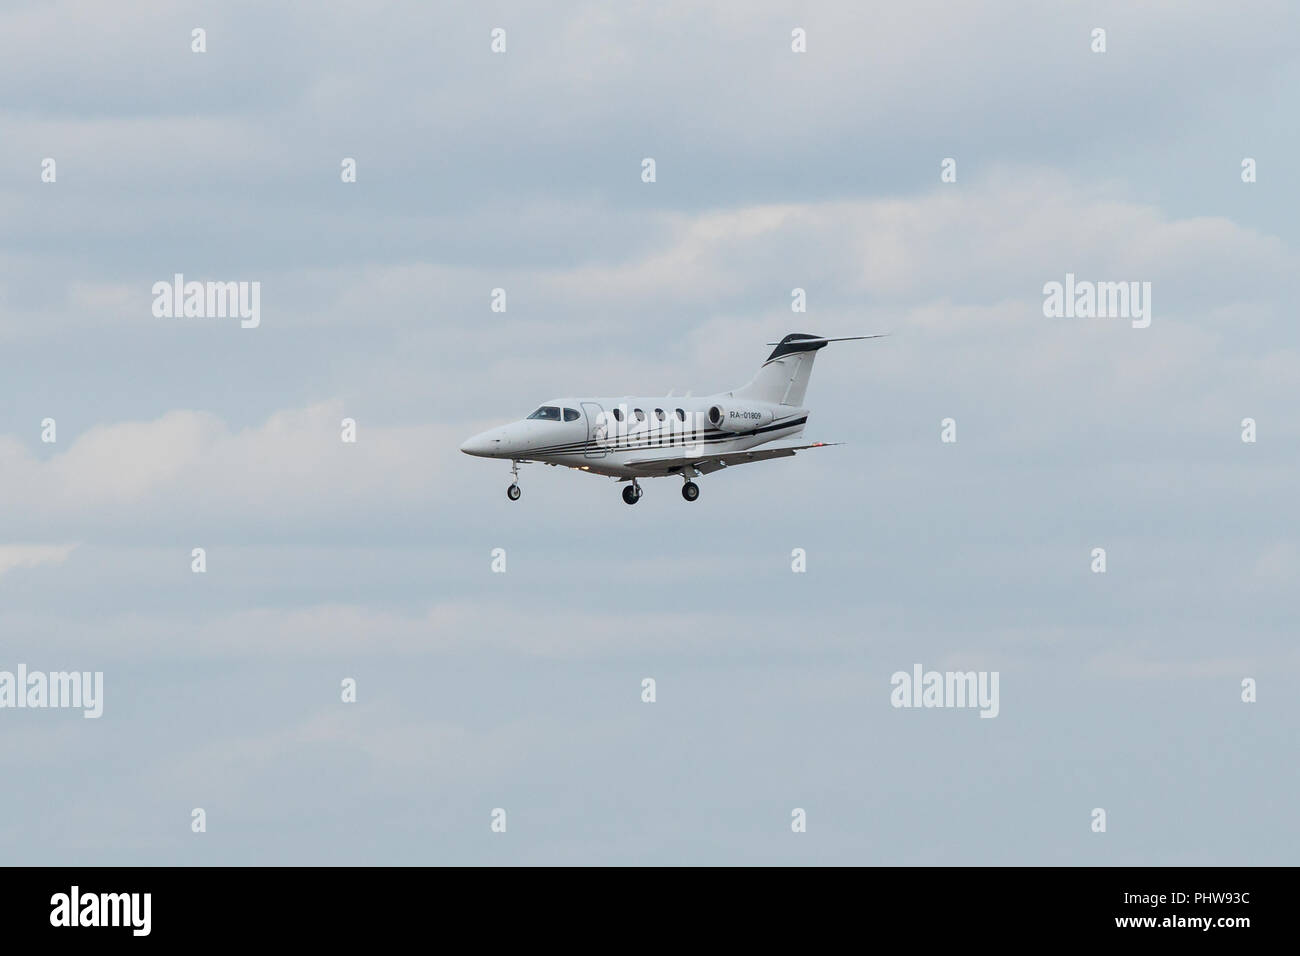 SAINT PETERSBURG, RUSSIA - APRIL 09, 2017: Flying the Raytheon 390 Premier IA (OM-VPB) - Stock Image